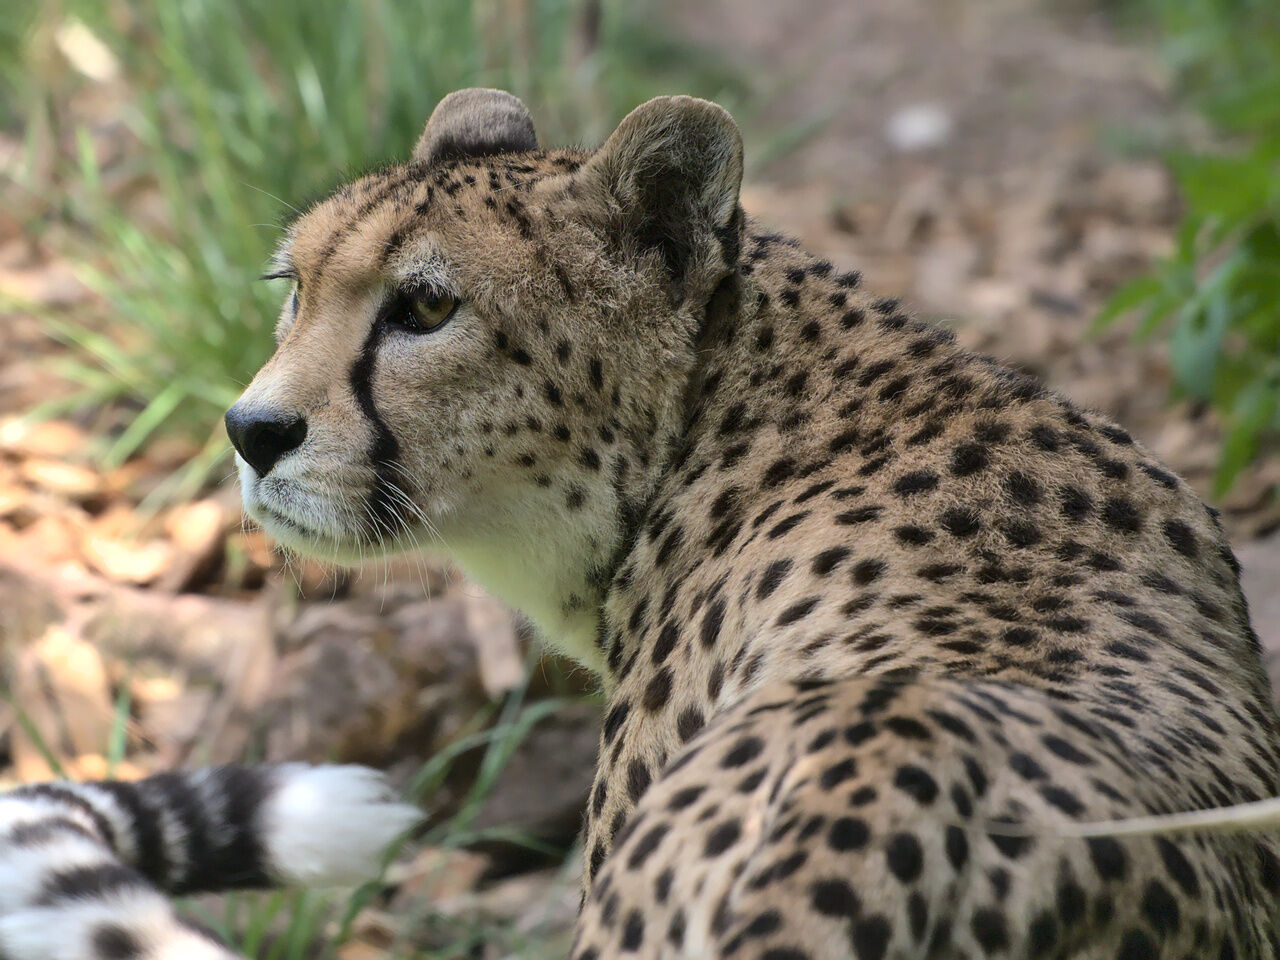 20200524_Zoo_Landau_034